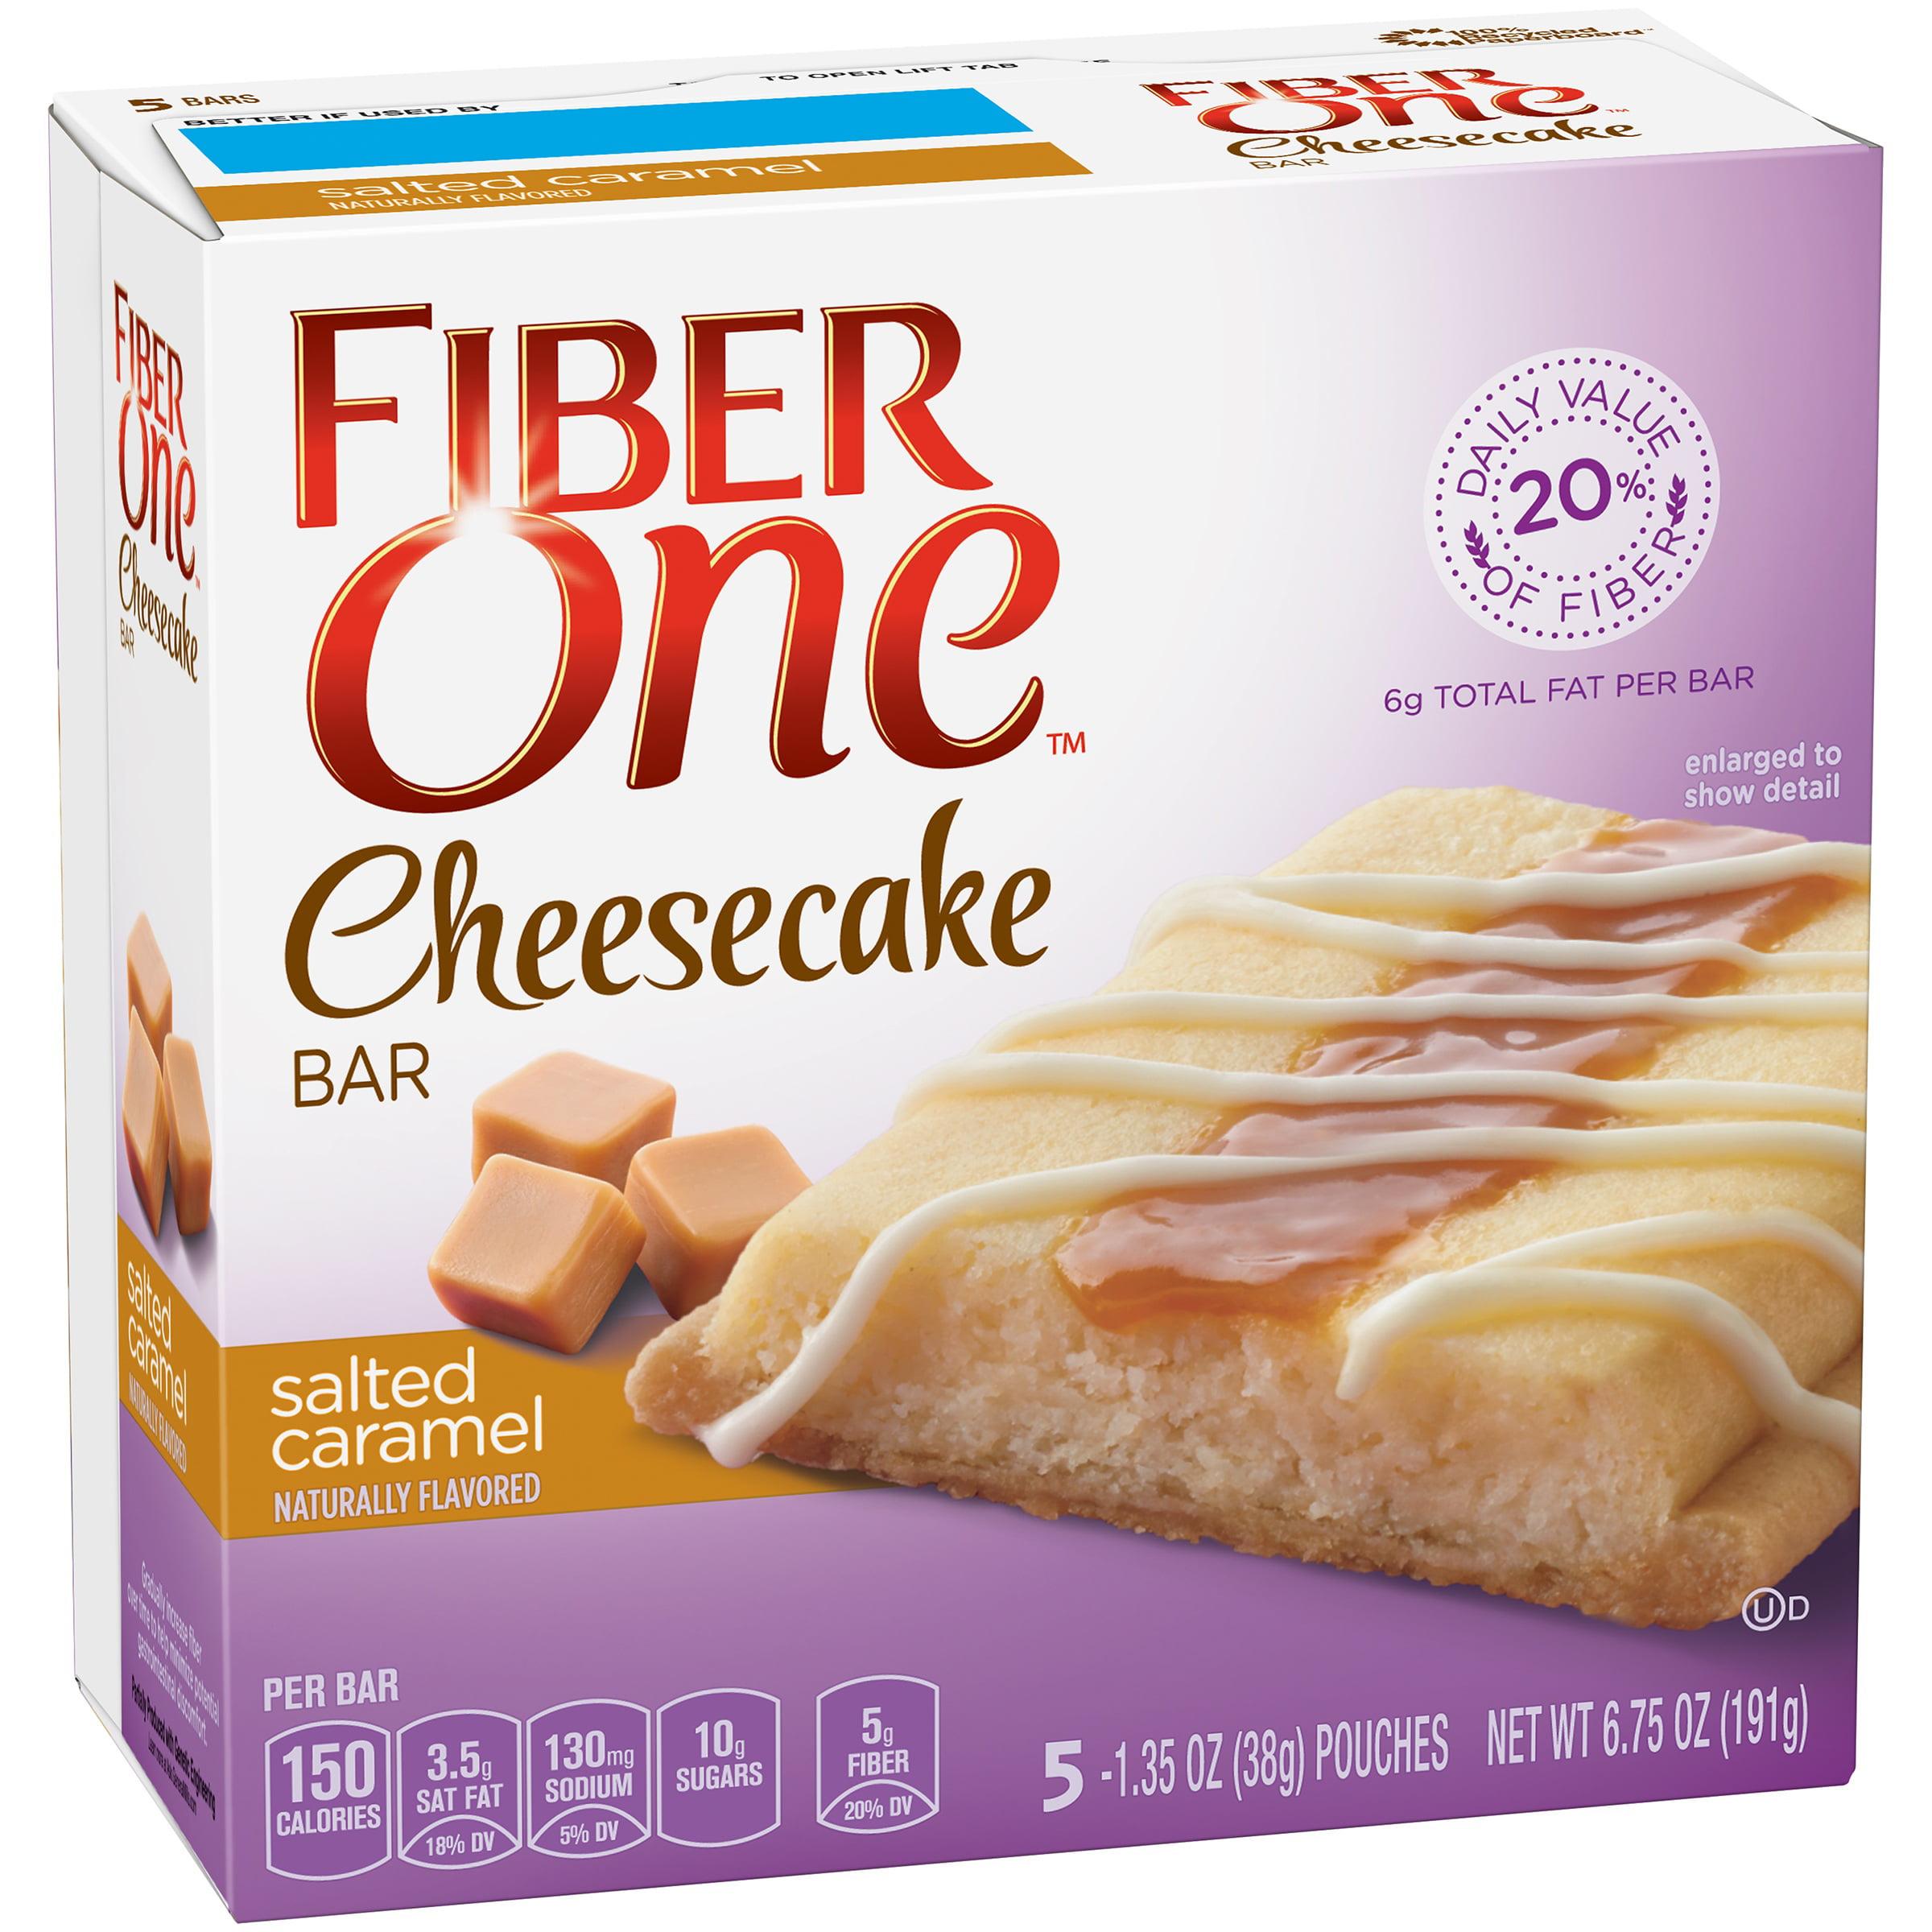 Fiber One Cheesecake Bar Salted Caramel 5 1.35 oz Bars by General Mills Sales, Inc.